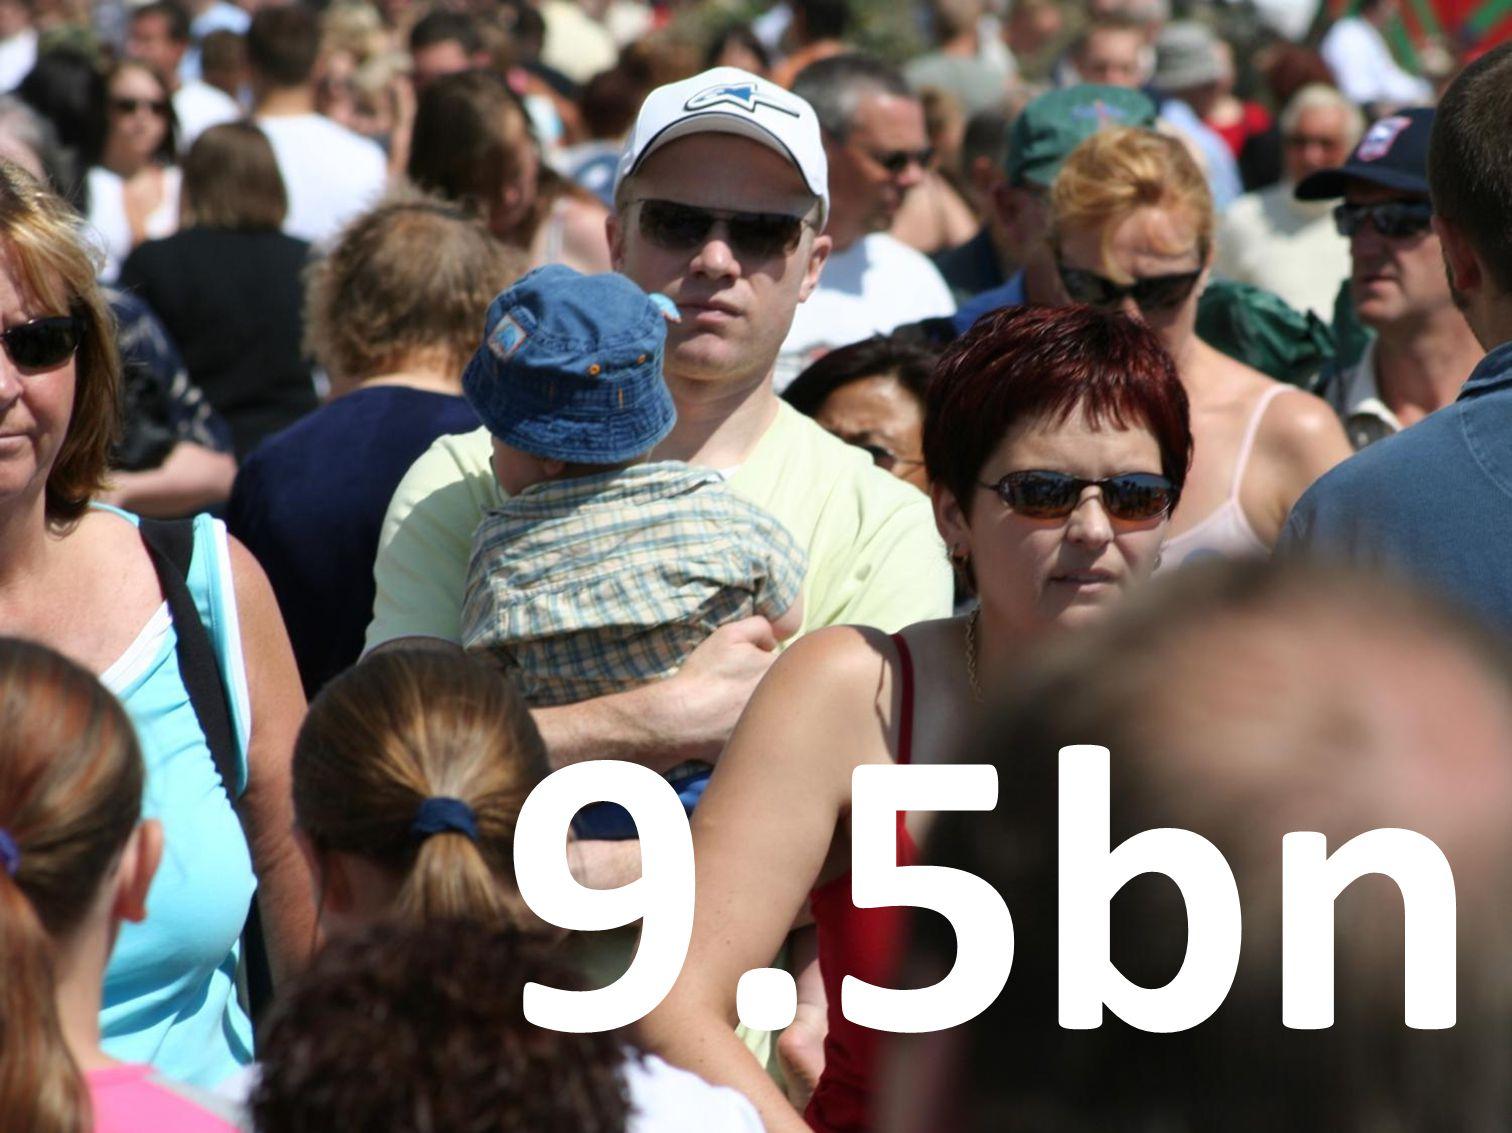 9.5bn